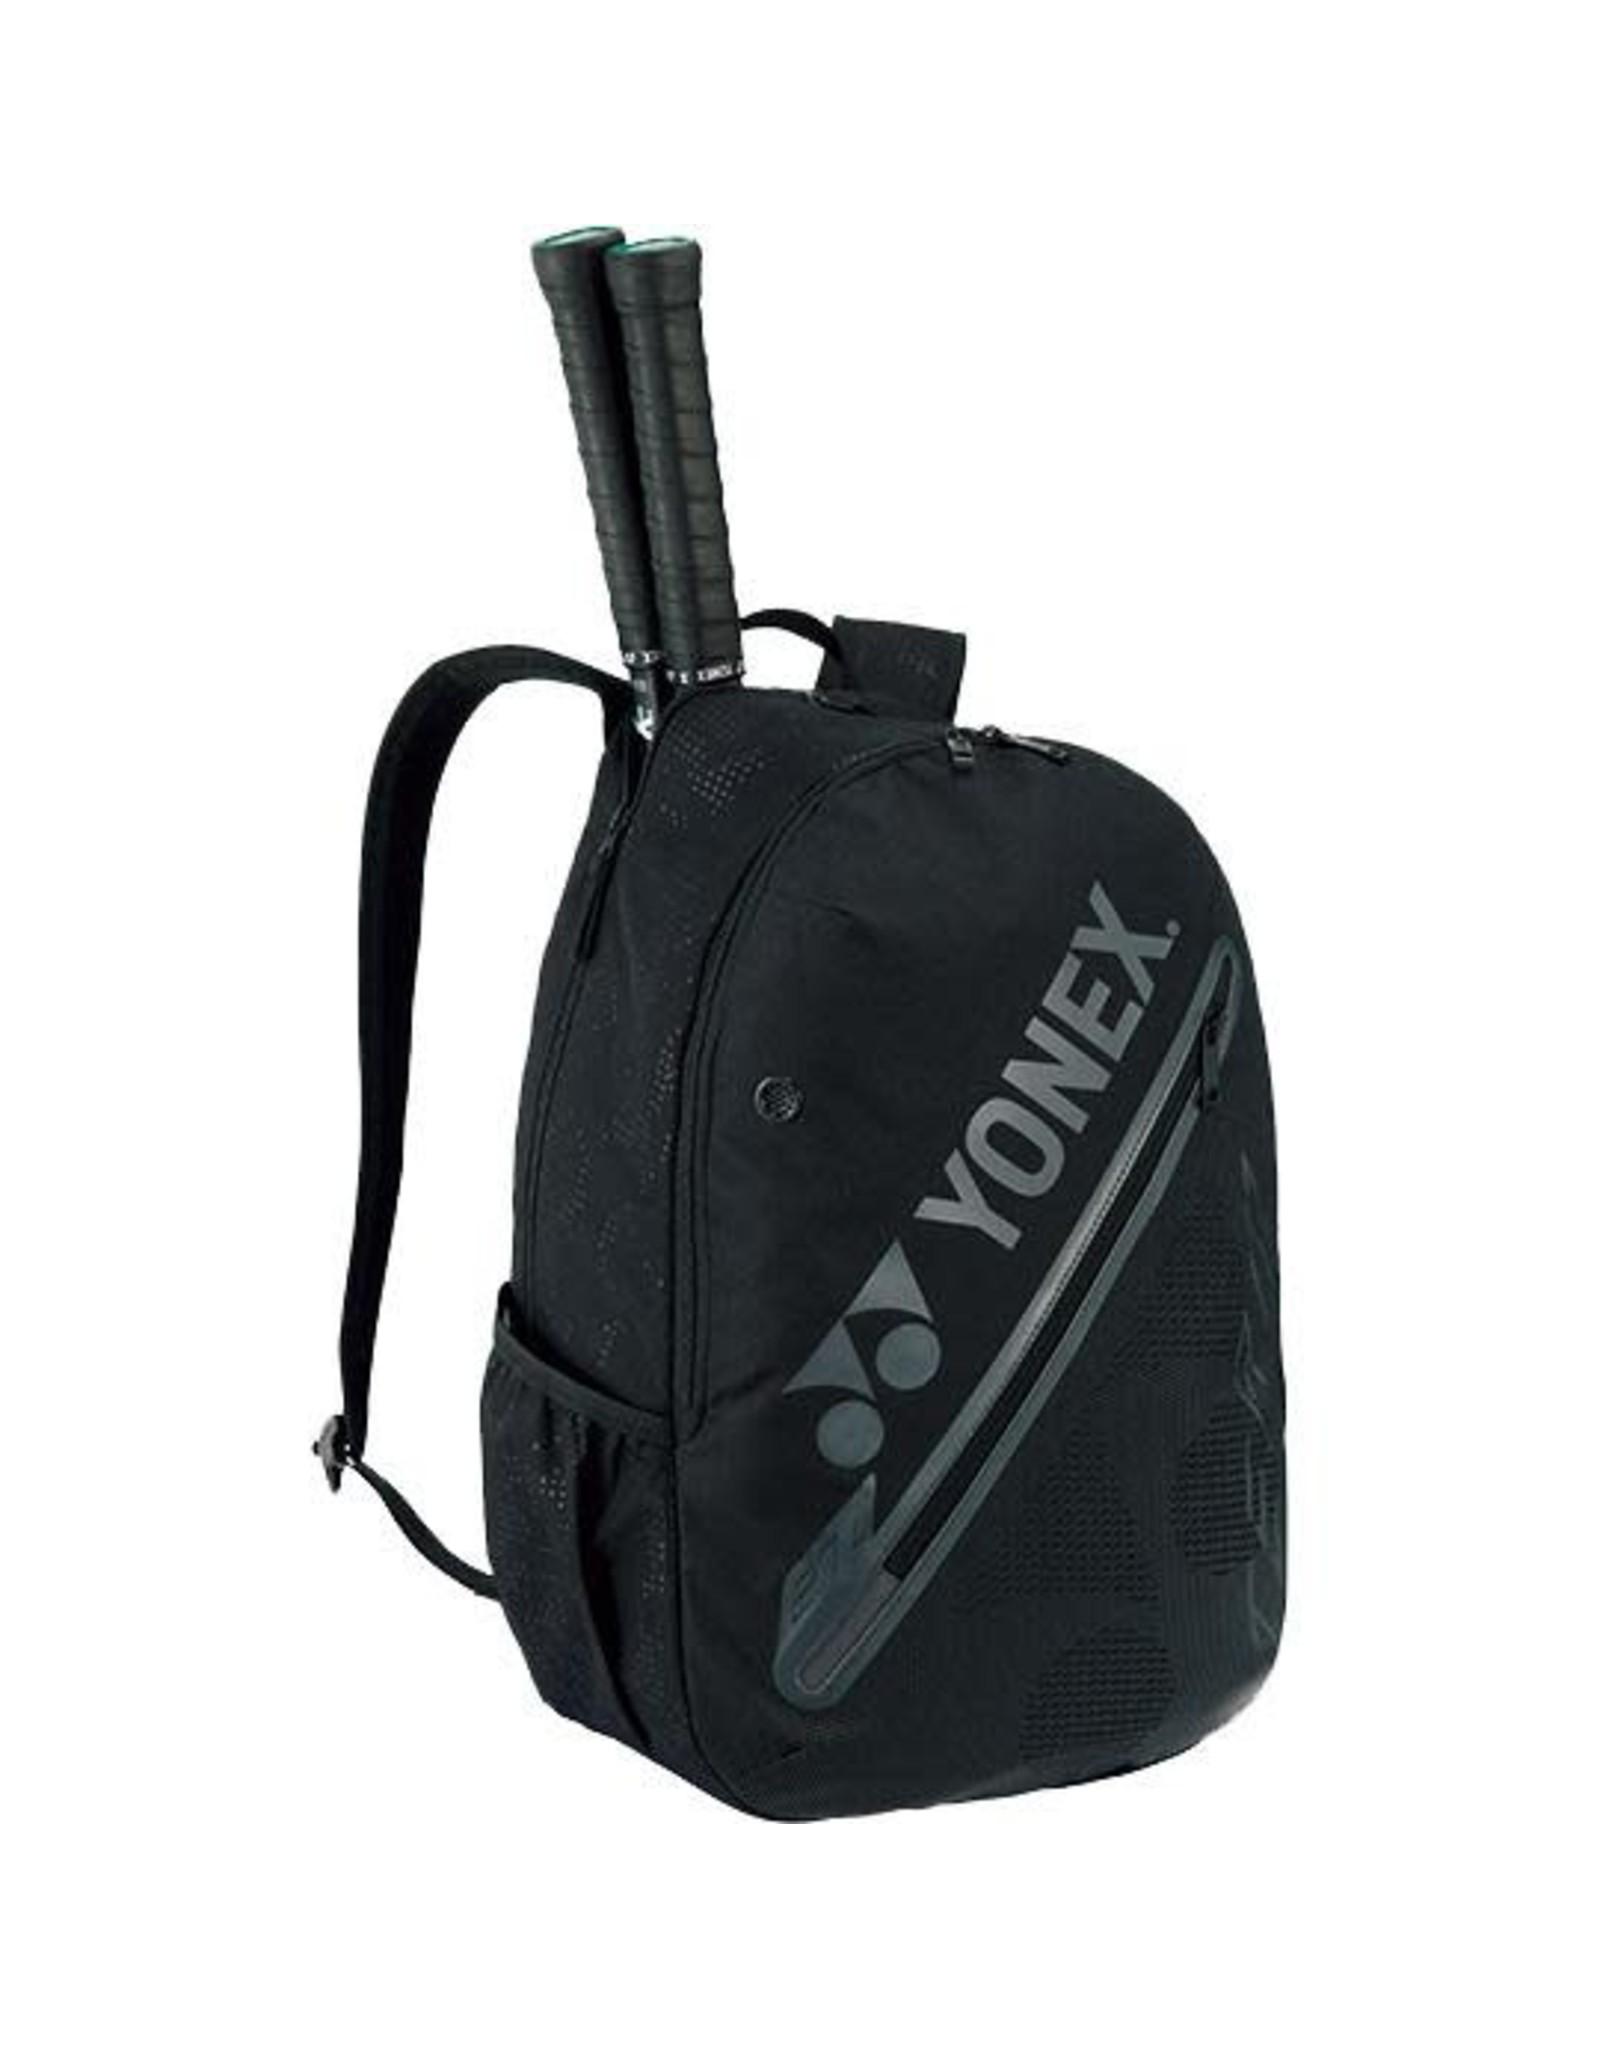 Yonex Yonex Backpack Black